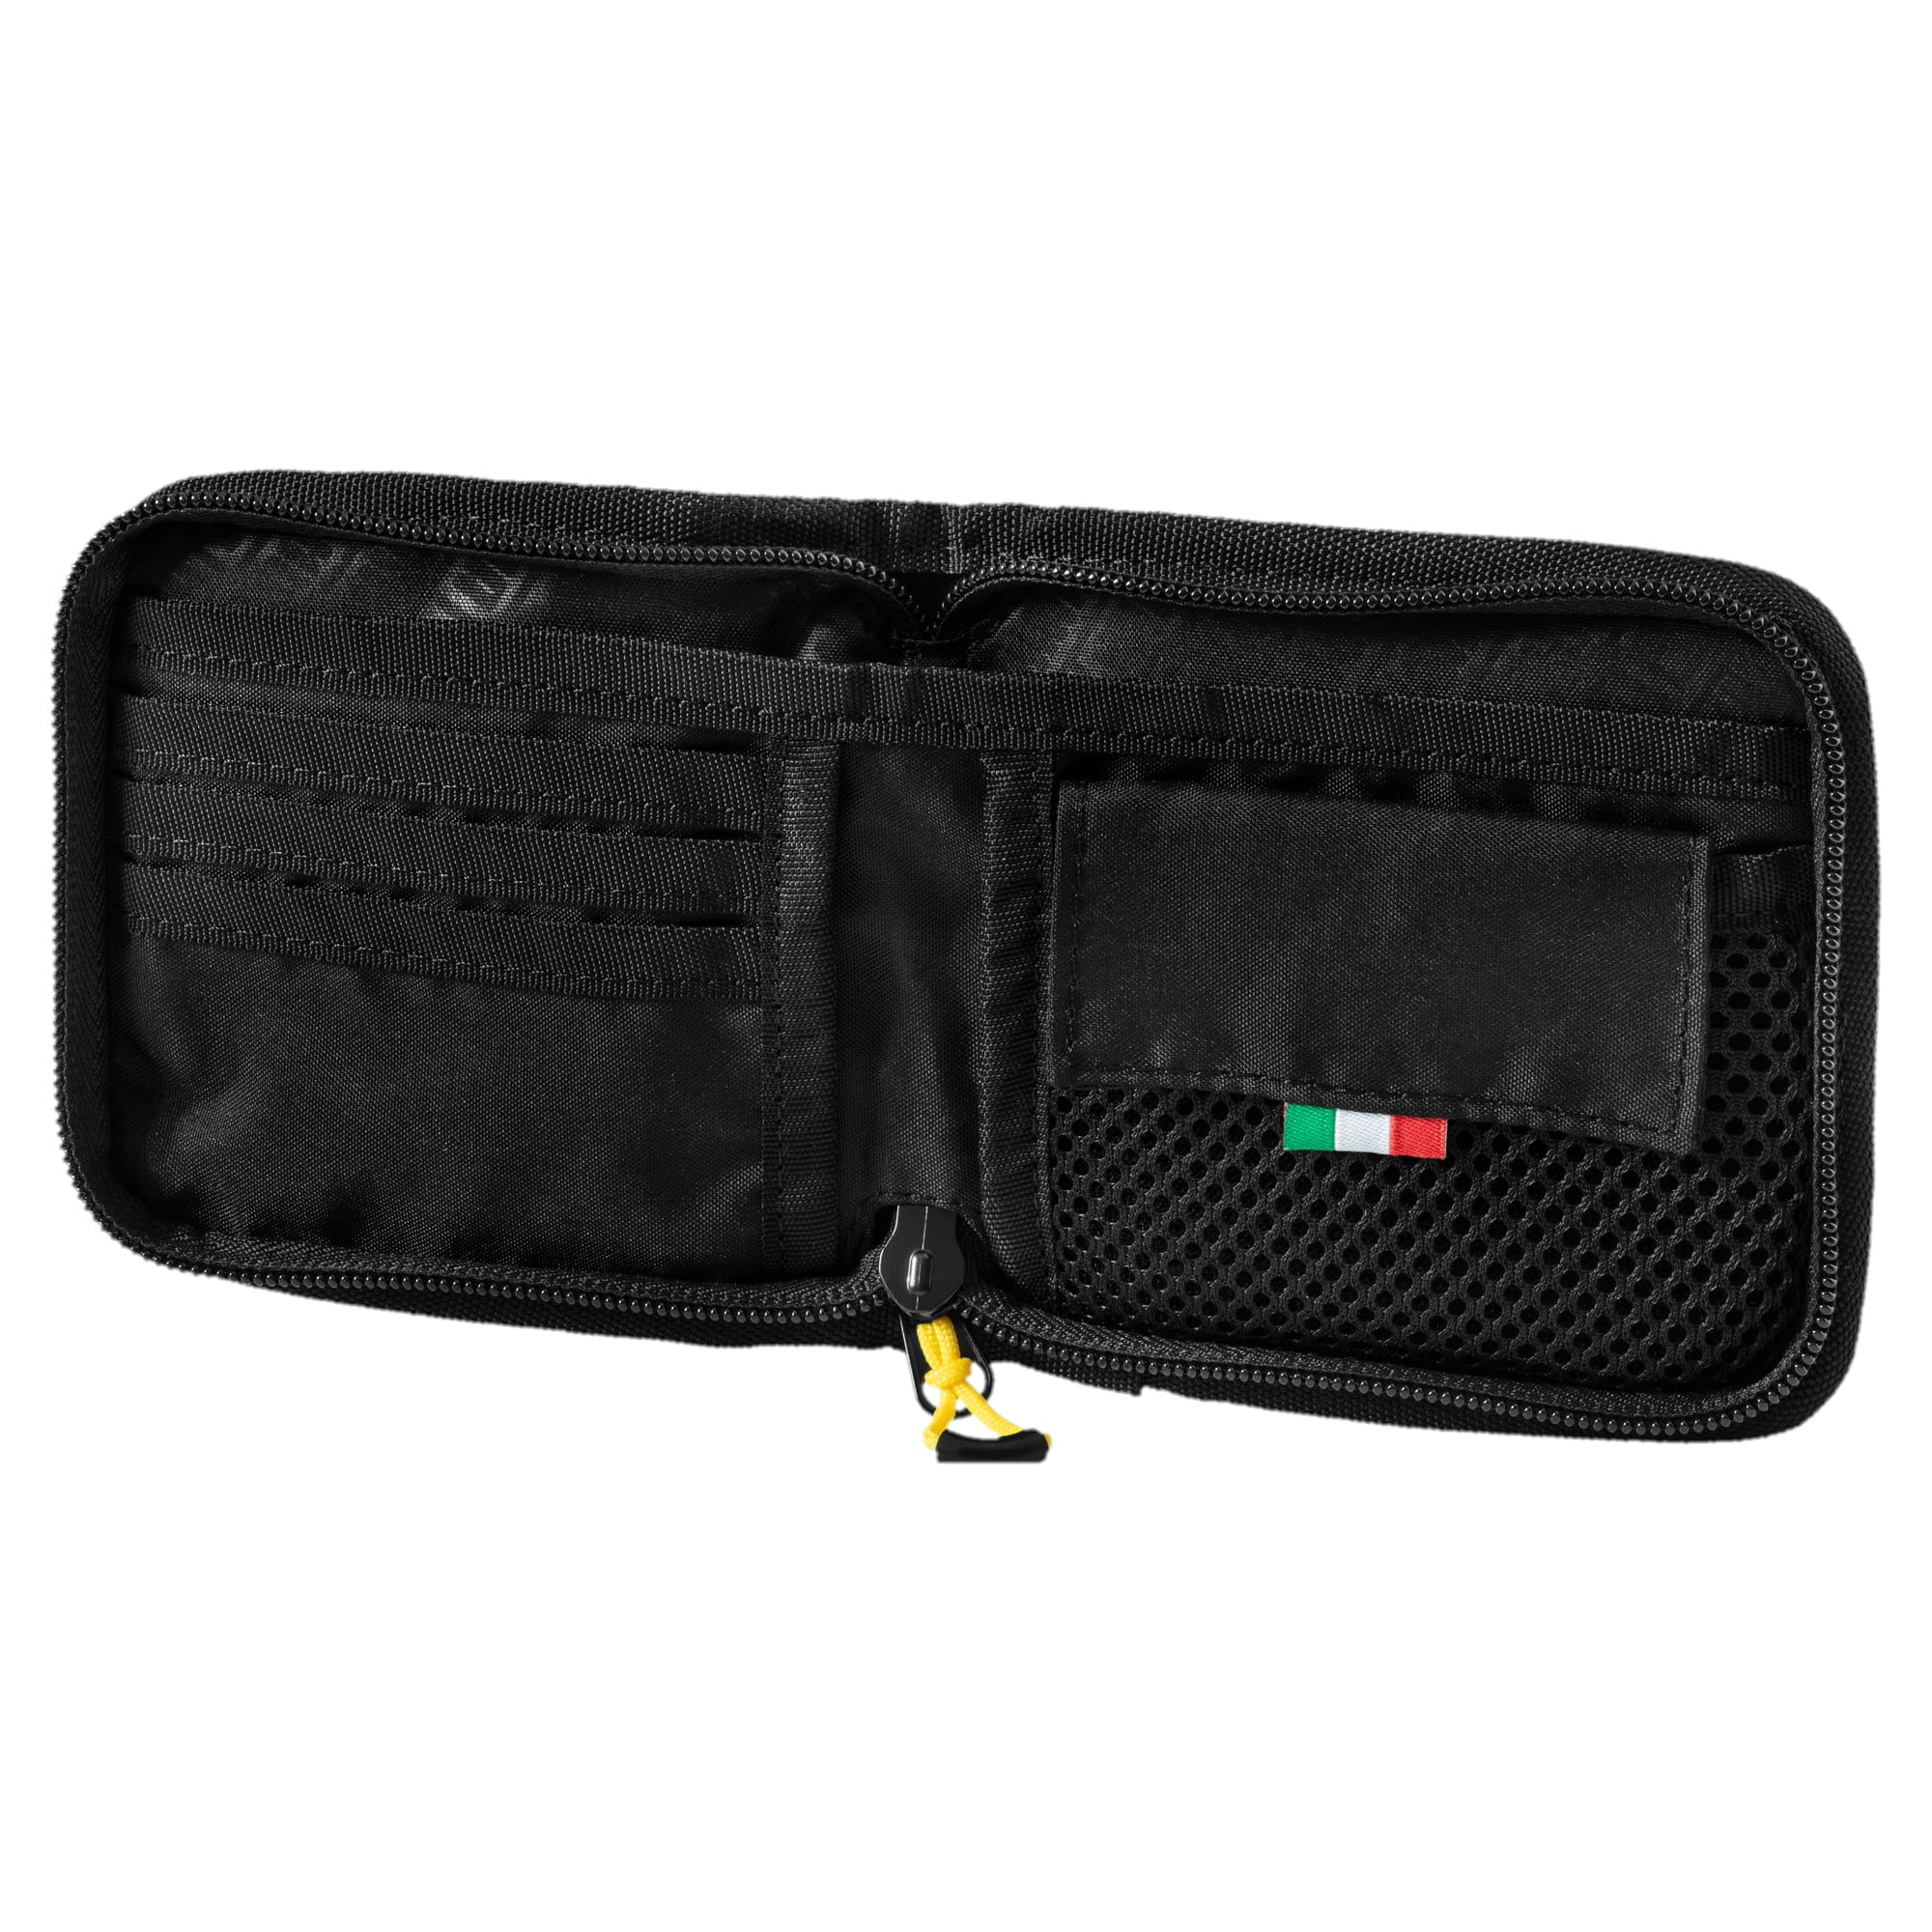 Thumbnail 3 of Ferrari Fanwear Wallet, Puma Black, medium-IND